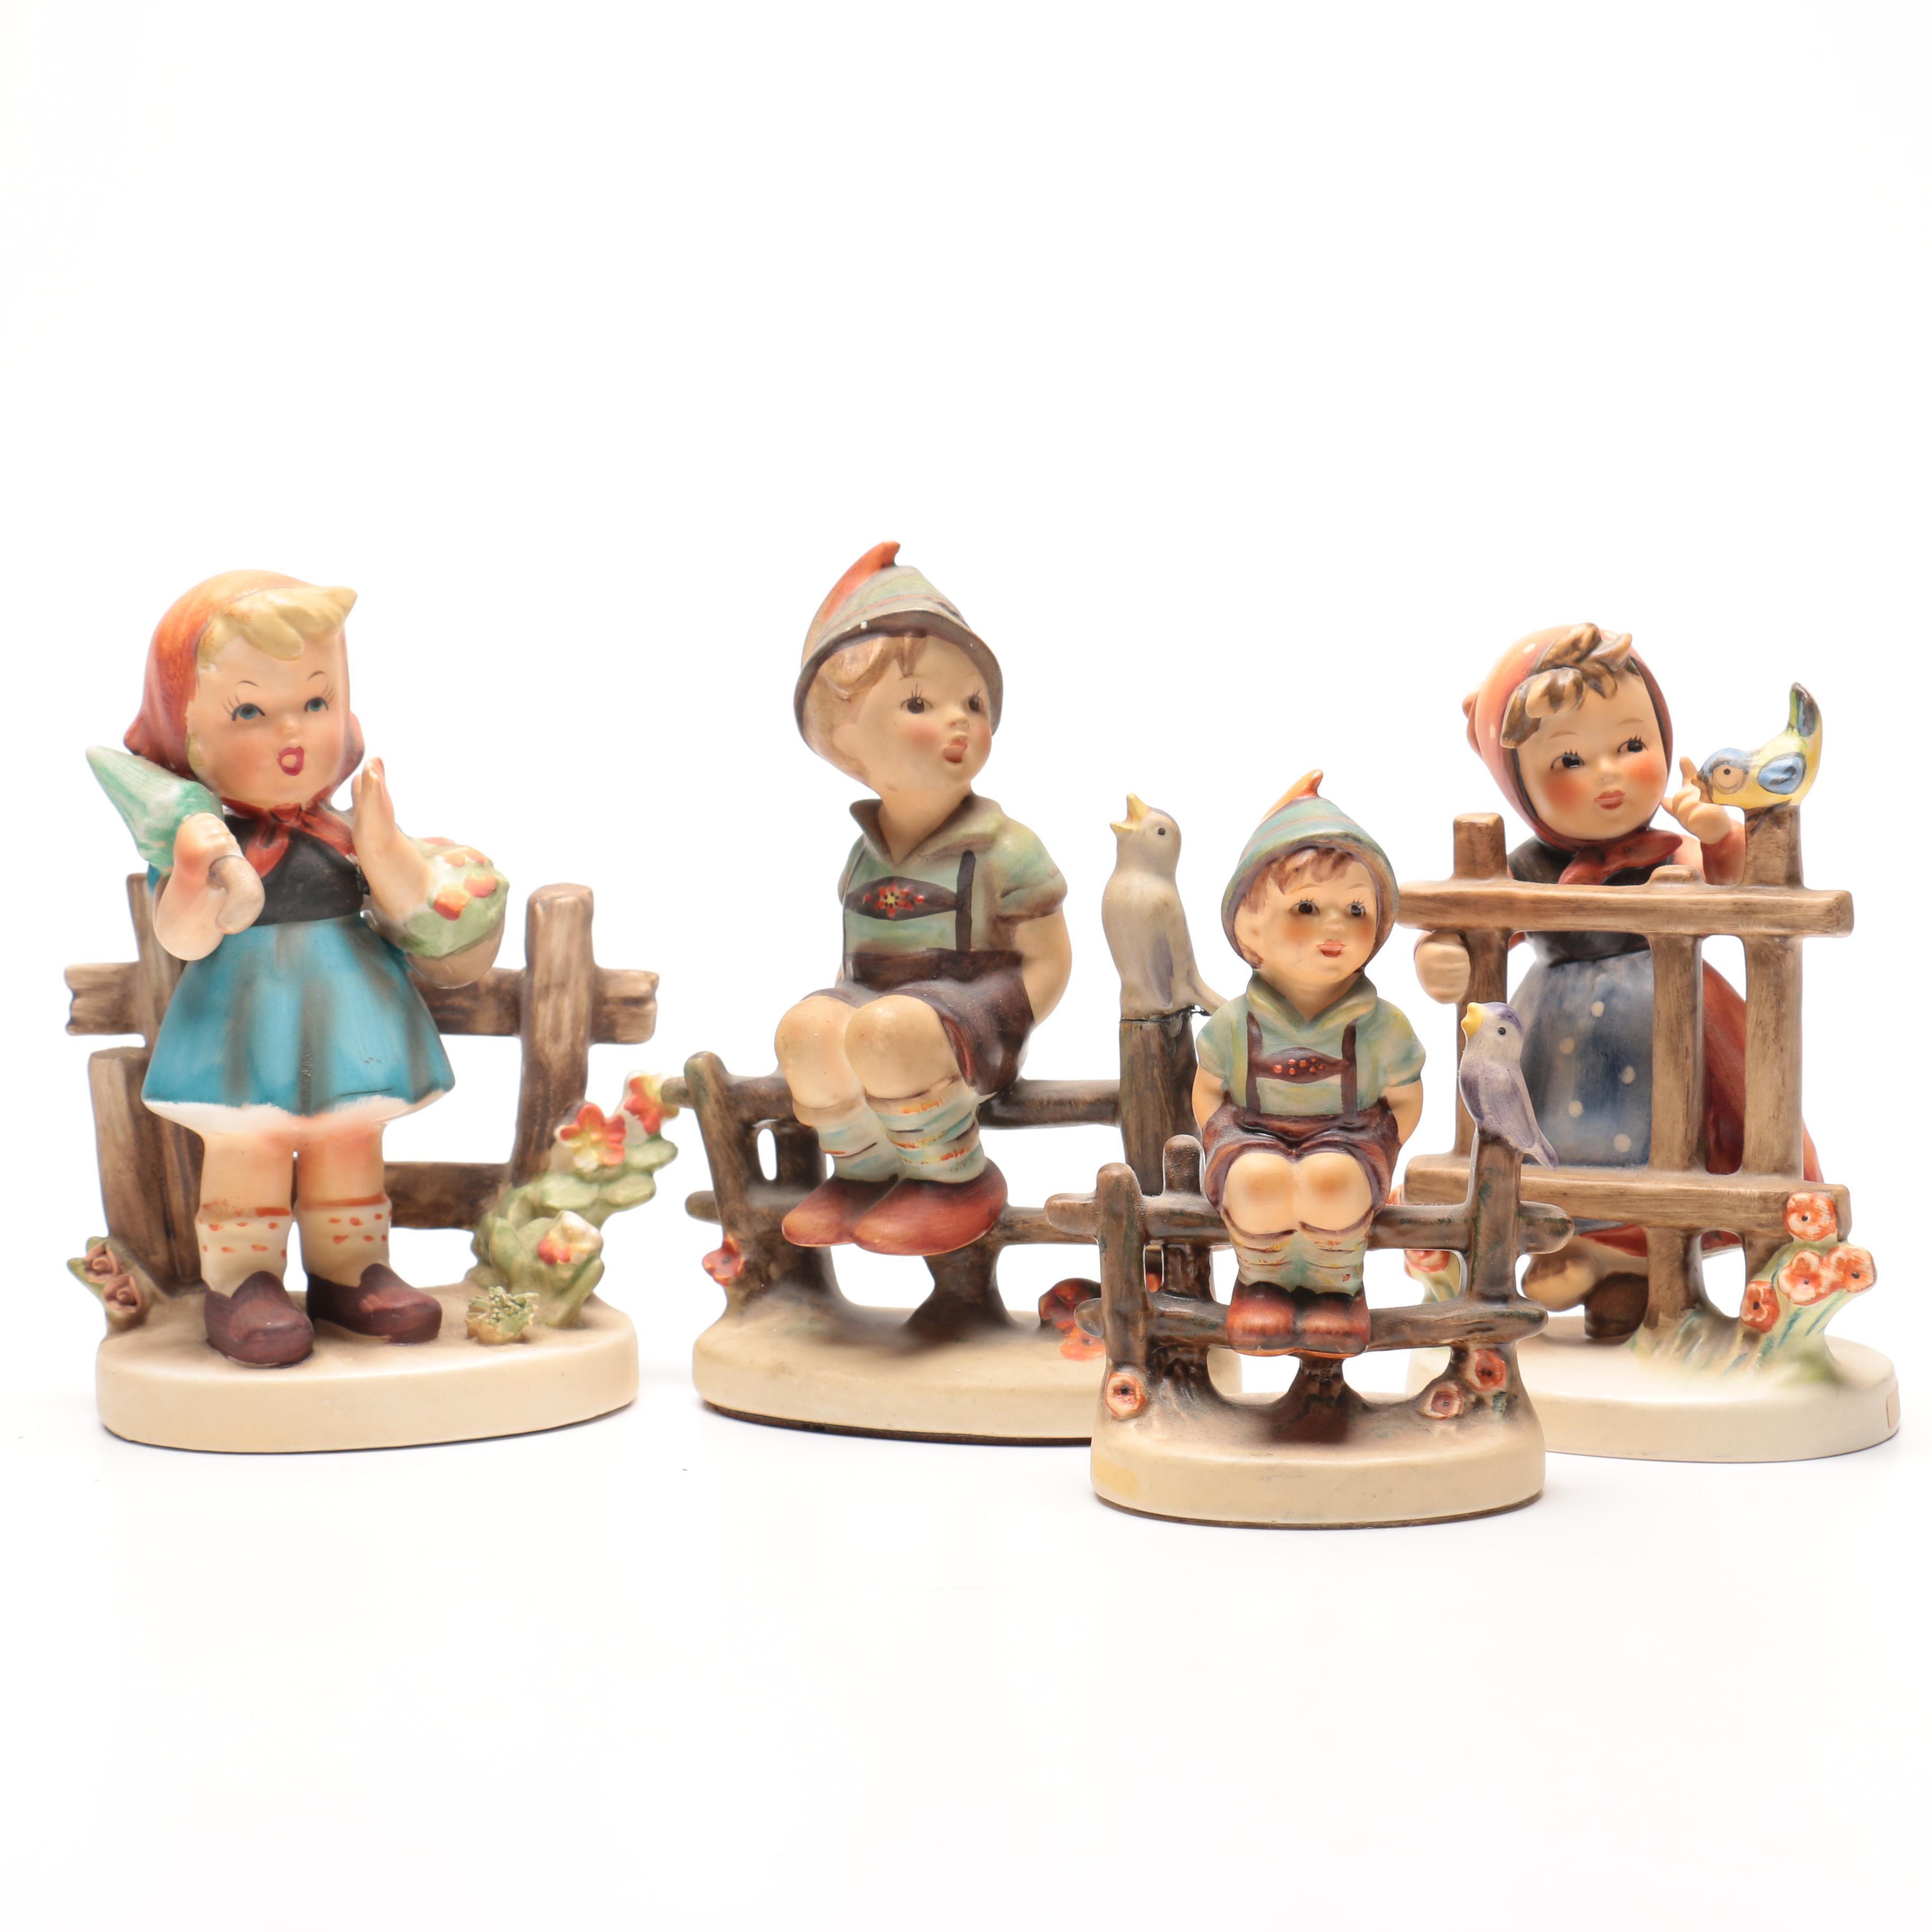 Four Hummel Figurines